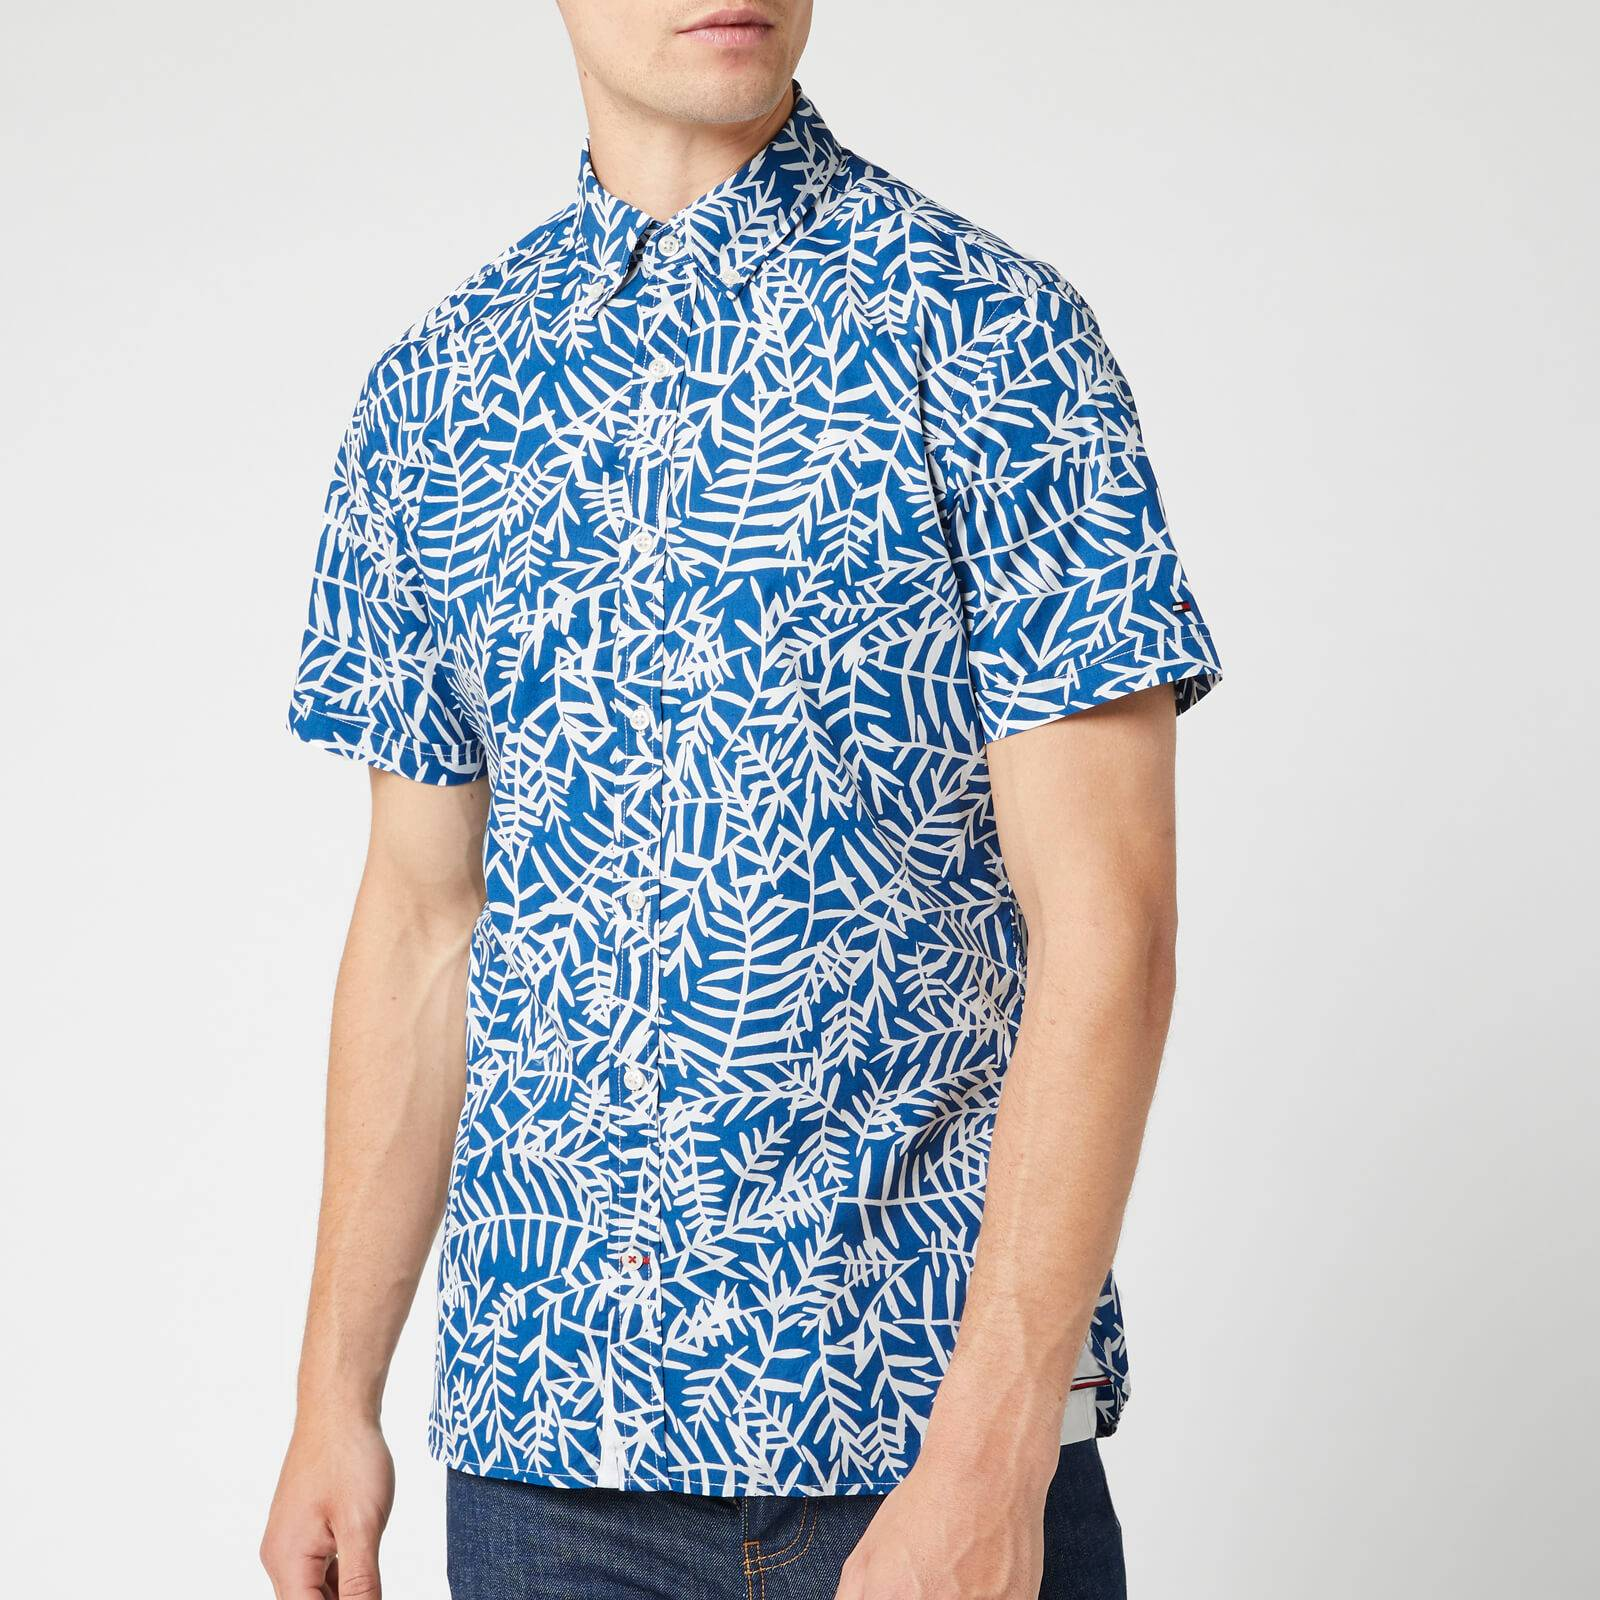 Tommy Hilfiger Men's Slim Large Leaf Print Shirt - Blue Quartz/Snow White - S - Blue